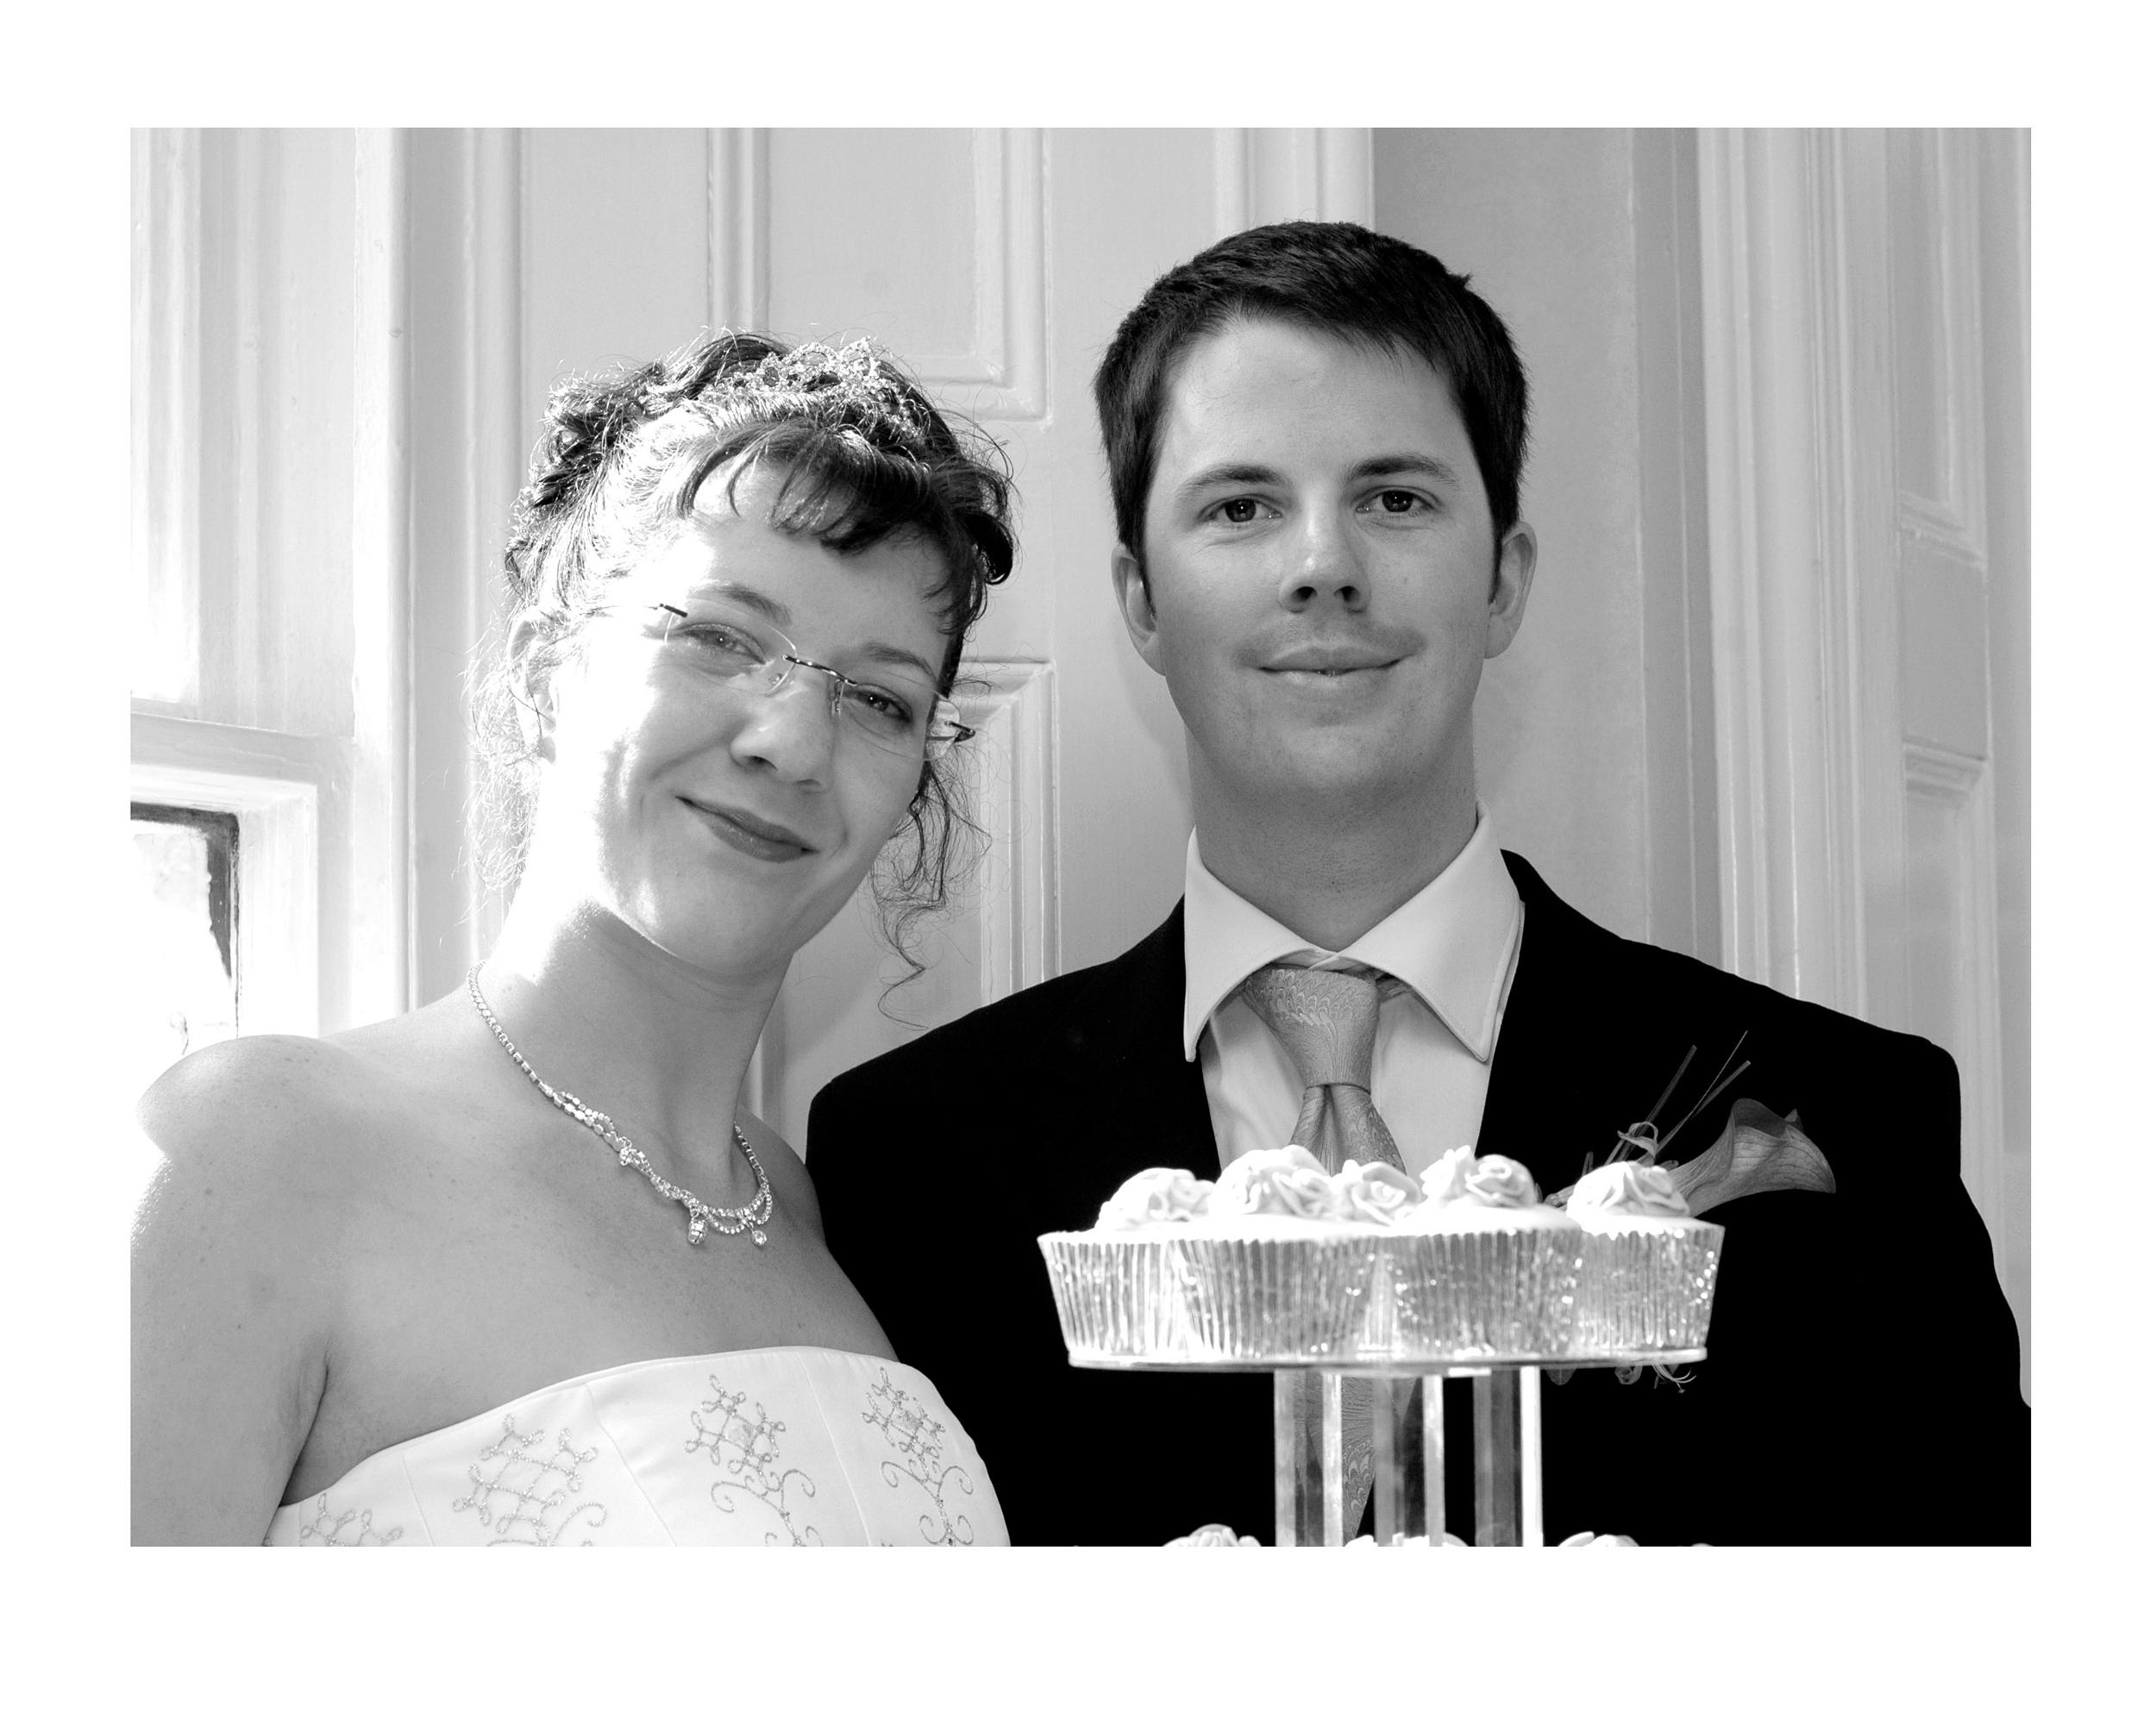 REPORTAGE-WEDDING-PHOTOGRAPHY-SET-UK-42.jpg